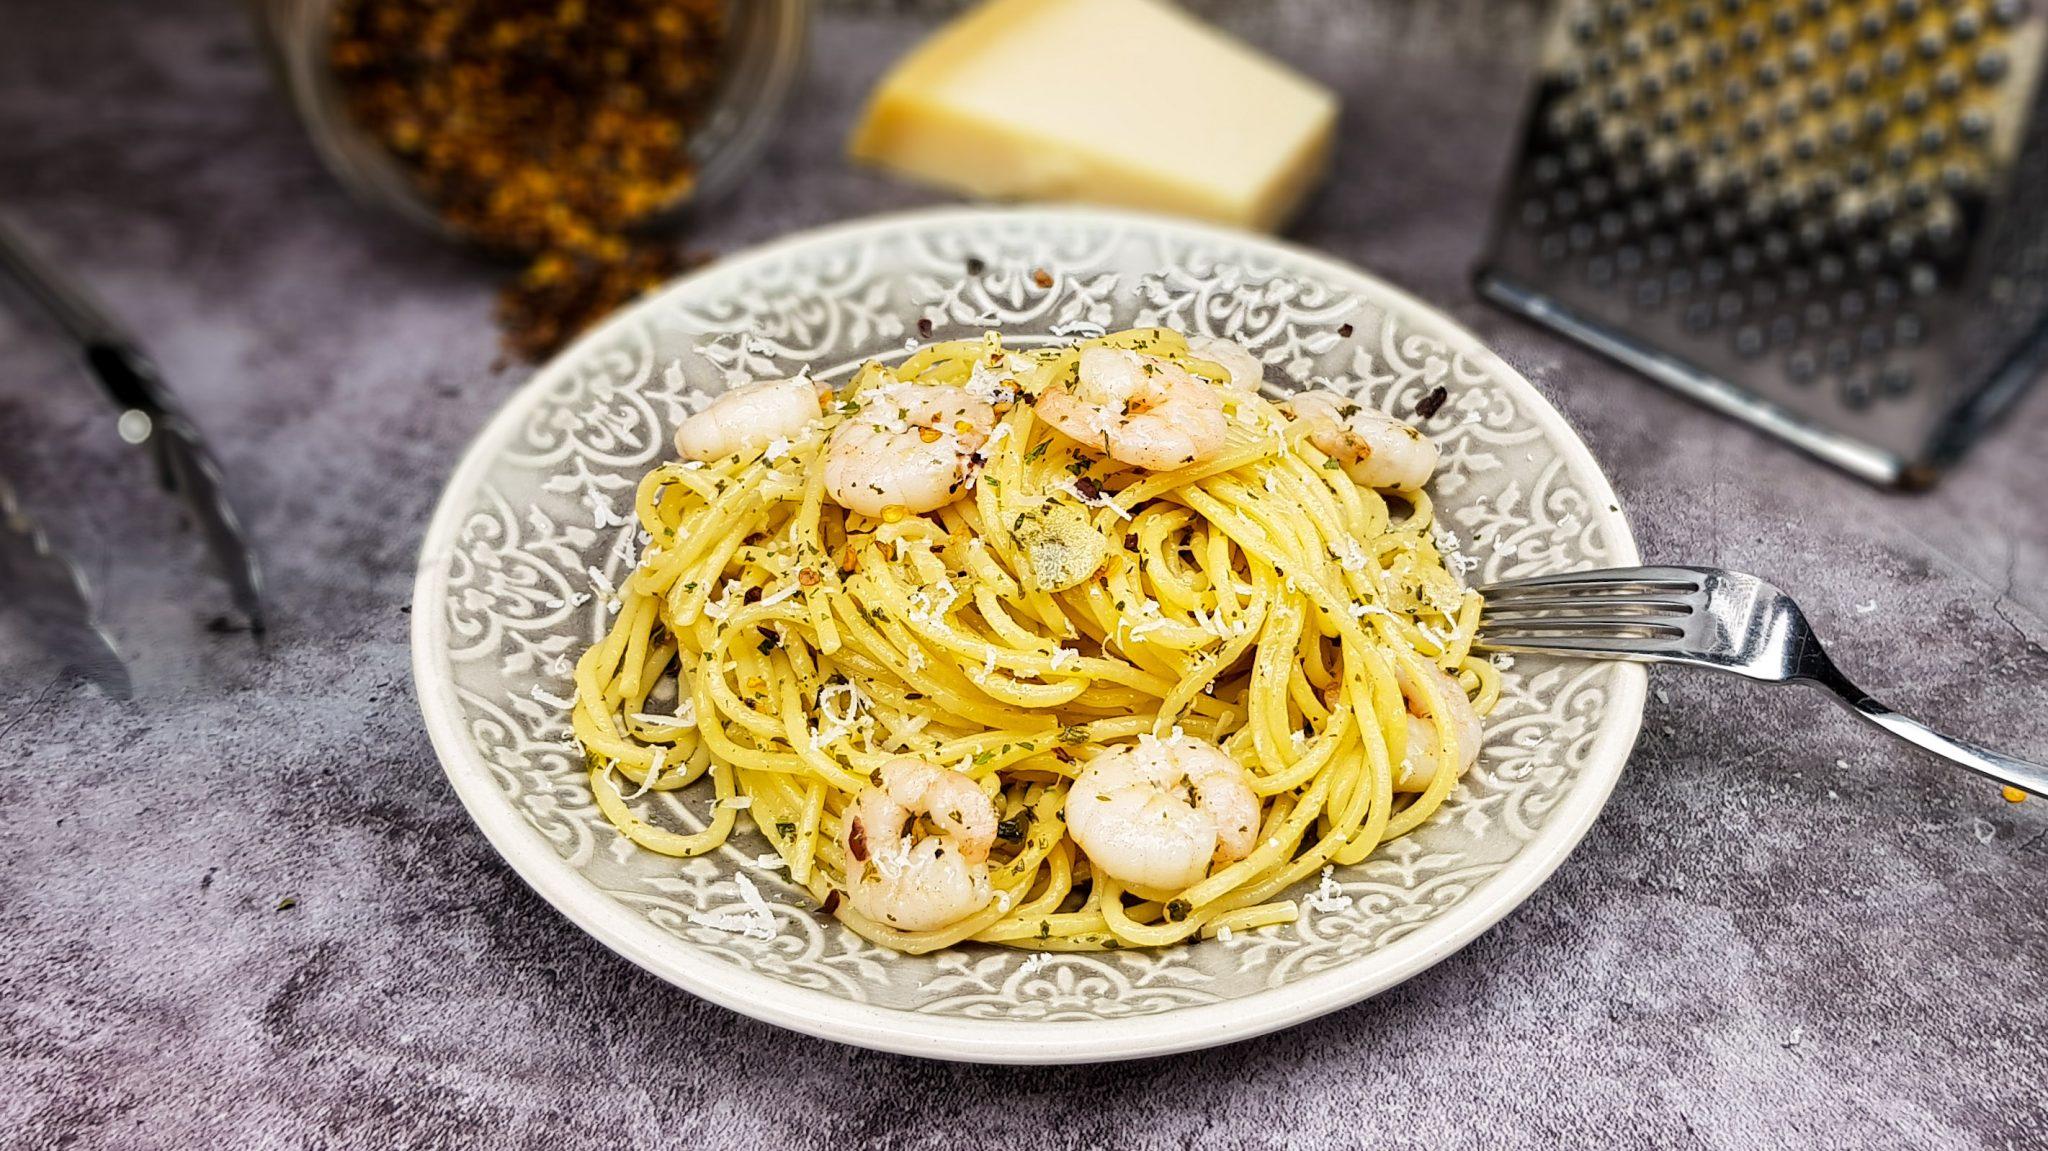 Pasta met garnalen en knoflook (spaghetti agli olio con gamberi)